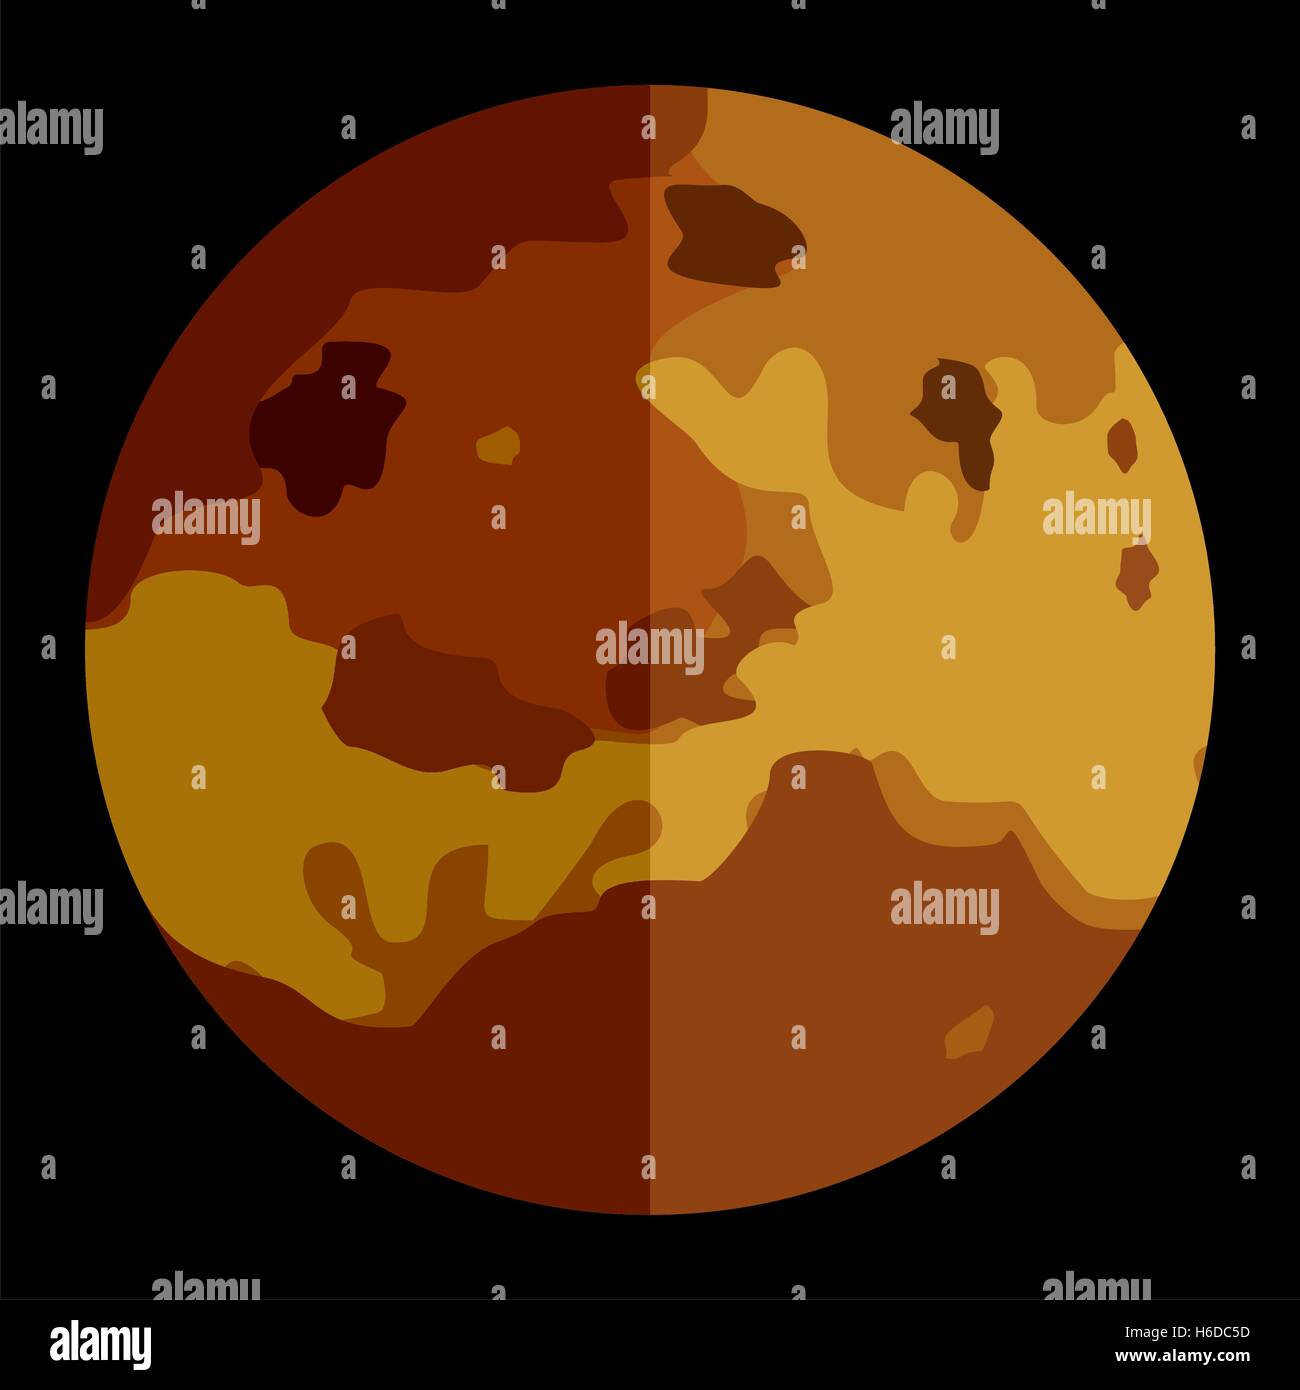 Vector solar system planet Venus - Stock Image